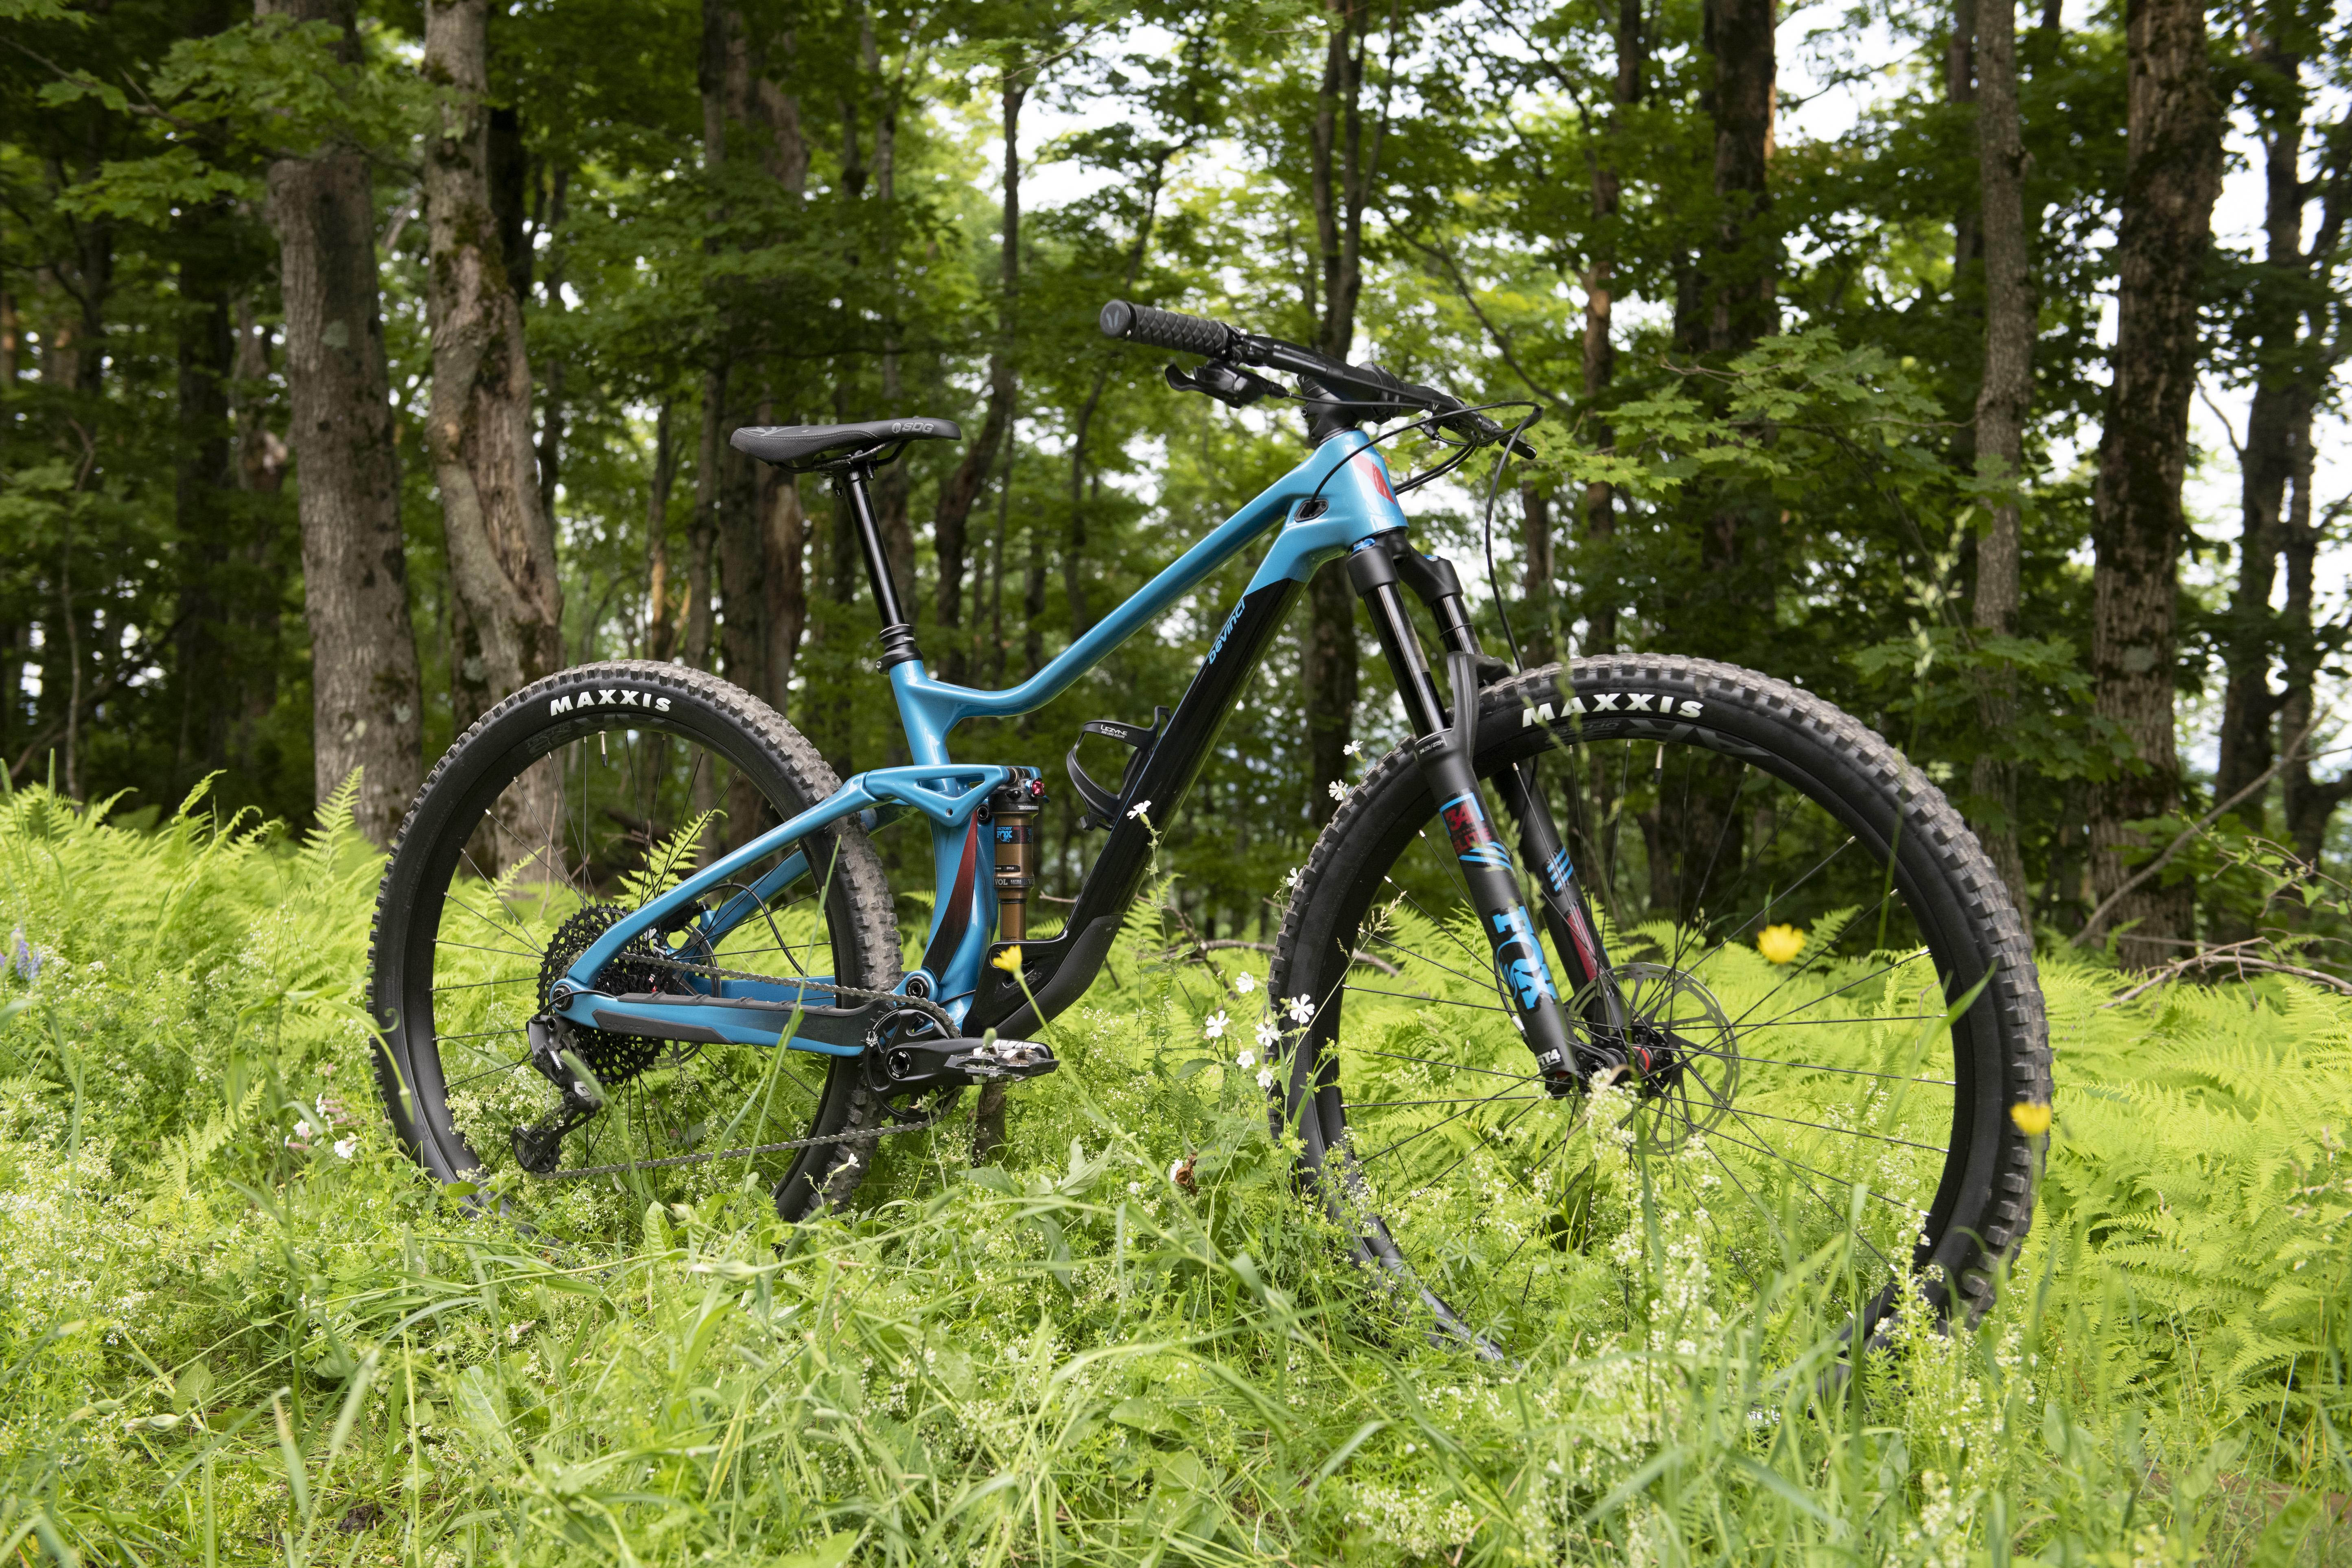 Devinci's Beloved Django Mountain Bike Receives Some Sweet Refinements for 2020 - Singletracks Mountain Bike News